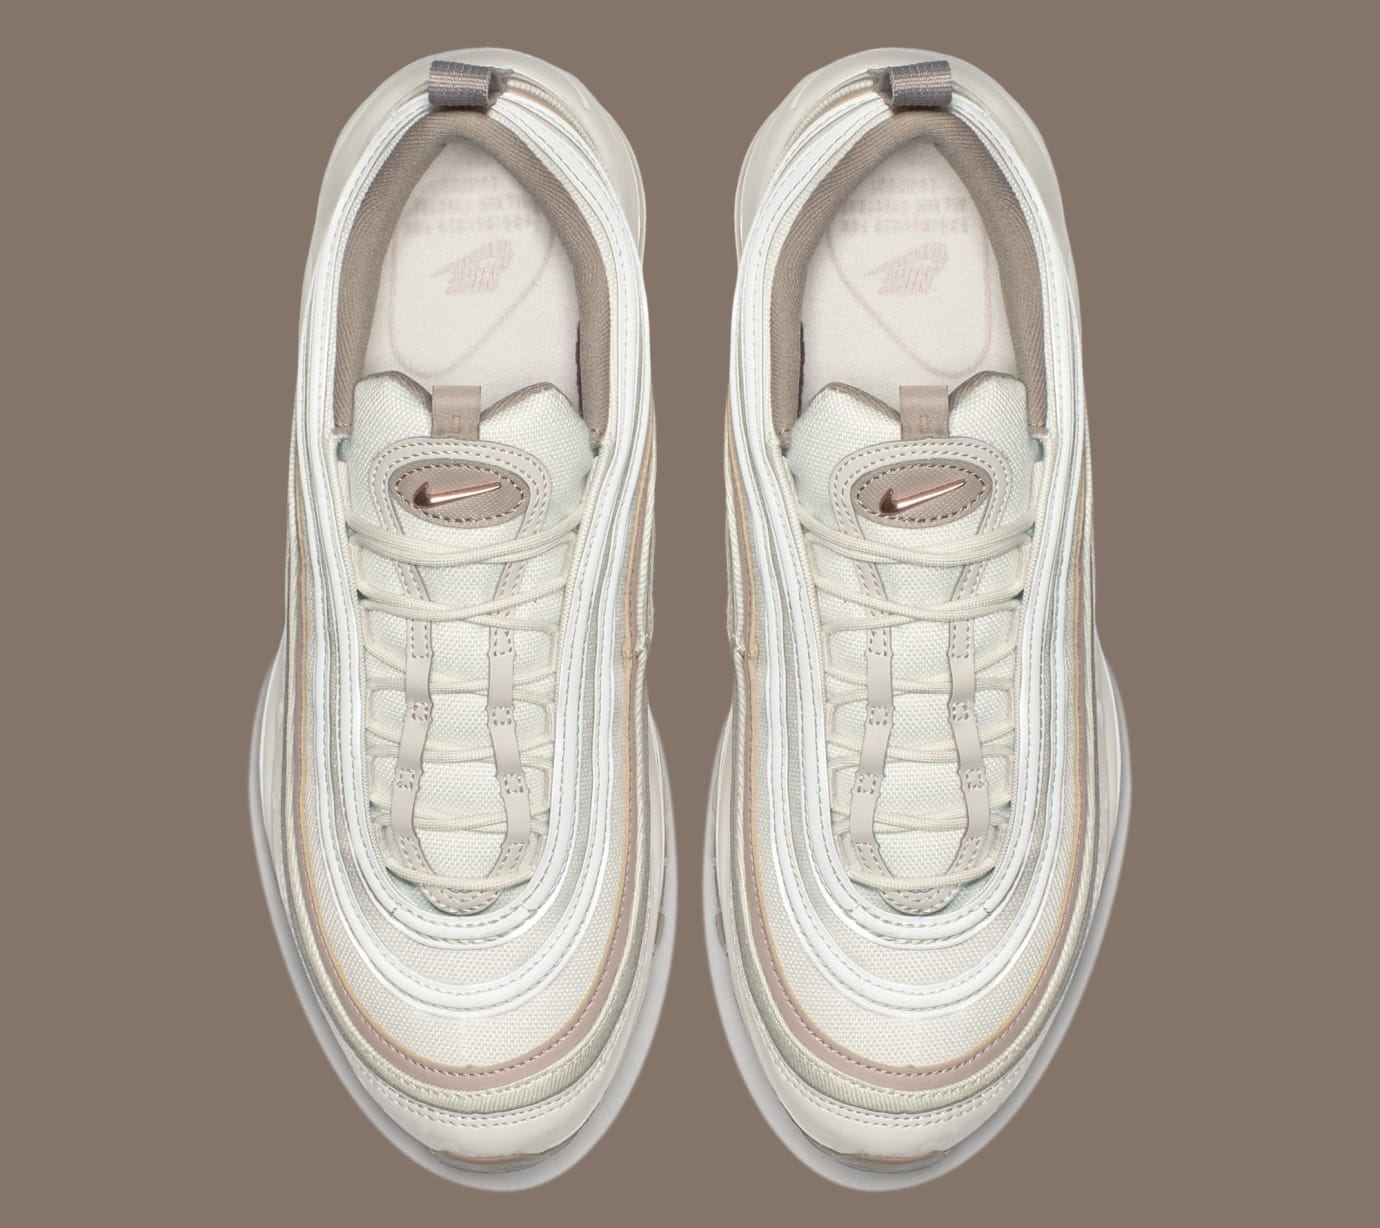 2295a9421ba34 Nike WMNS Air Max 97 Premium 'Light Bone/Diffused Taupe/Sepia Stone ...